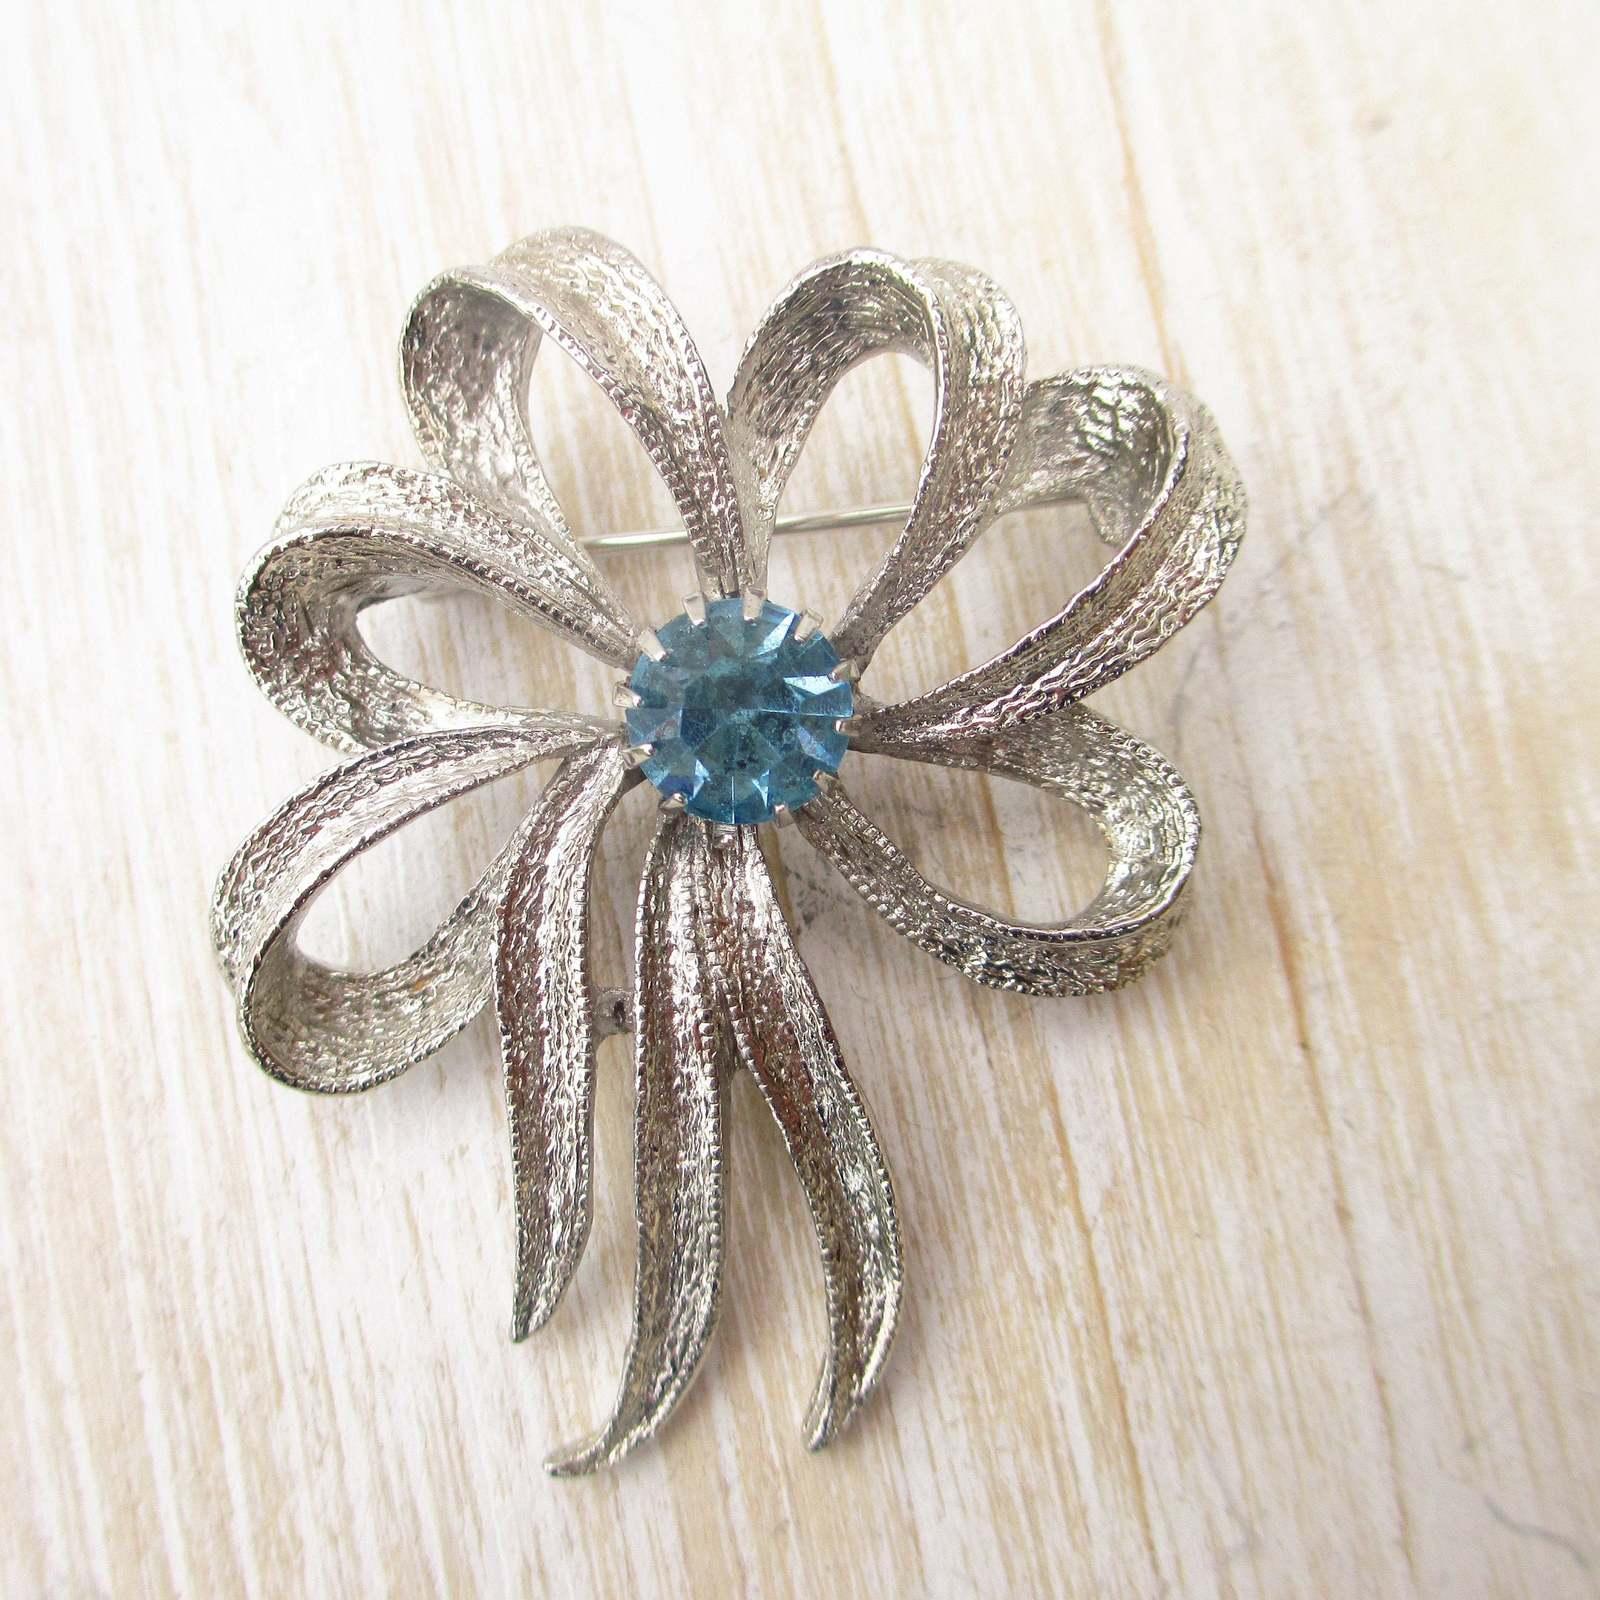 Vintage Liz Claiborne White Clear Rhinestone Heart Brooch Silver Tone Pin Jewelry Circa 1980/'s Crystal Costume Jewelry